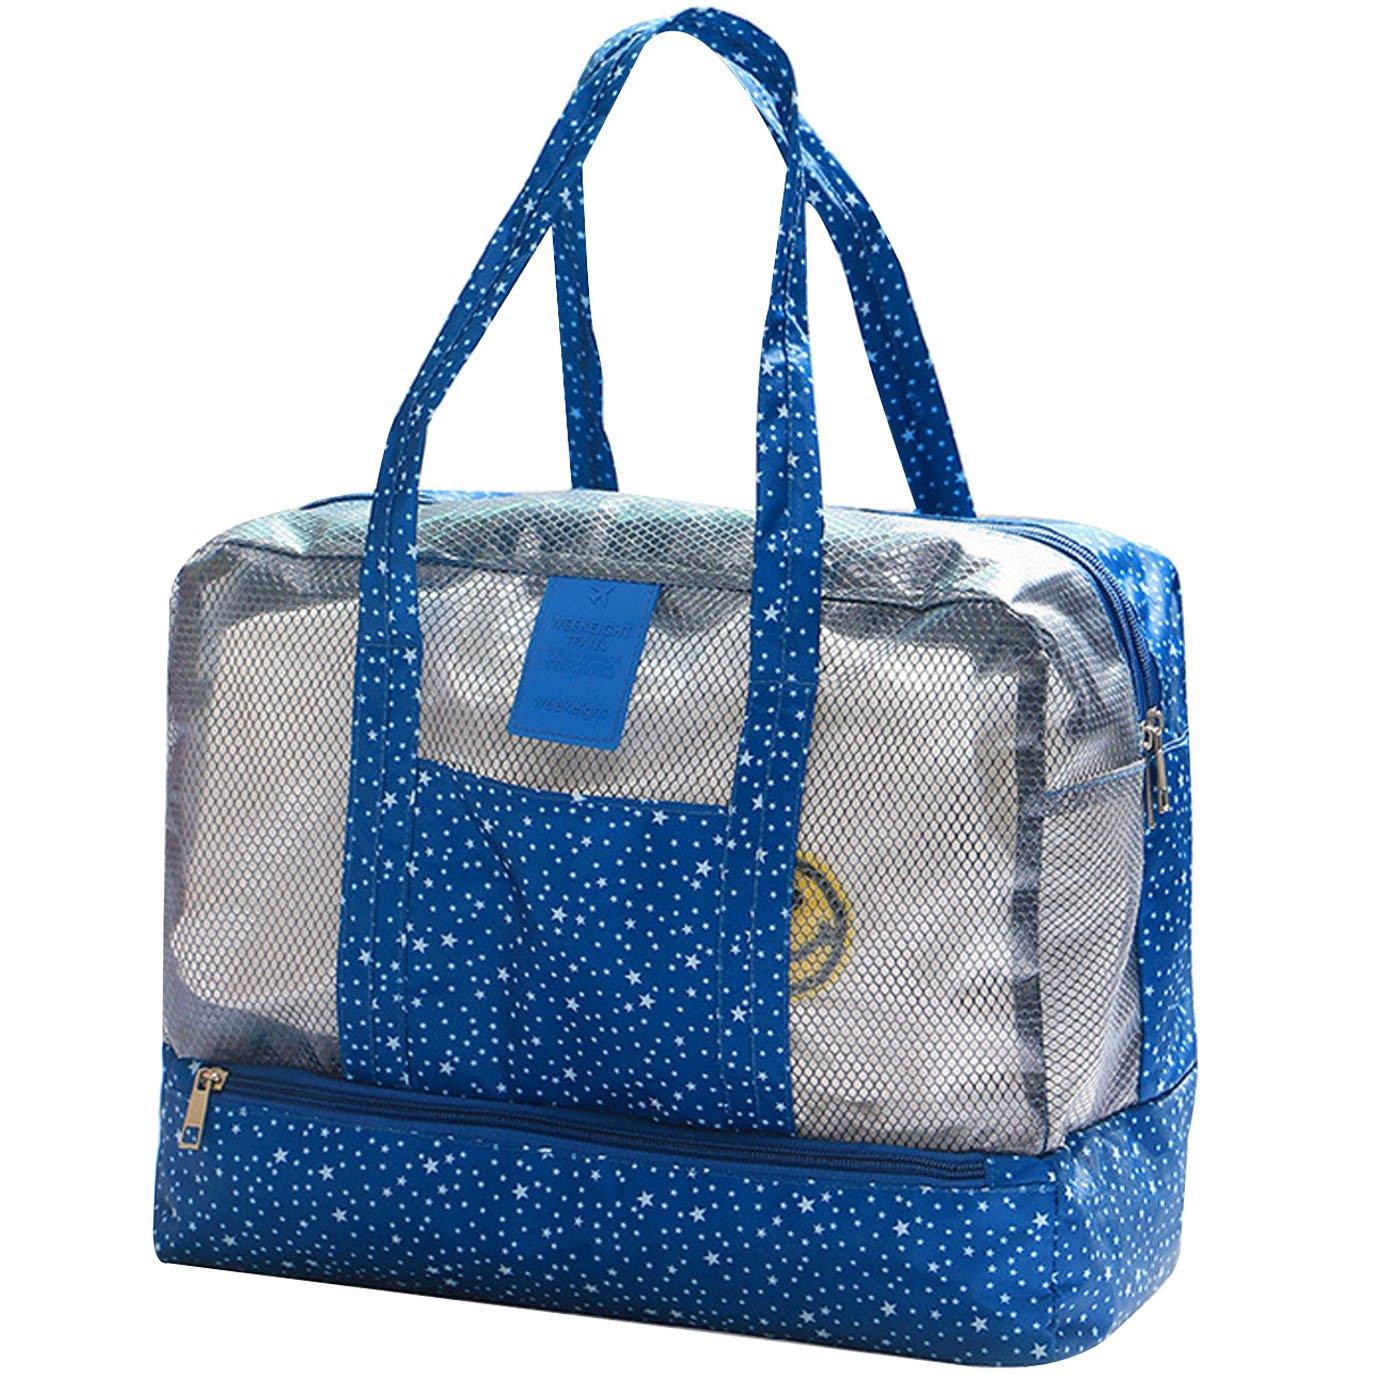 Monique防水ビーチBathing水泳ハンドバッグメイクアップオーガナイザーCosmetic Purse Wet Dry Separation Toiletries Bag forメンズレディース B074N3SPK7